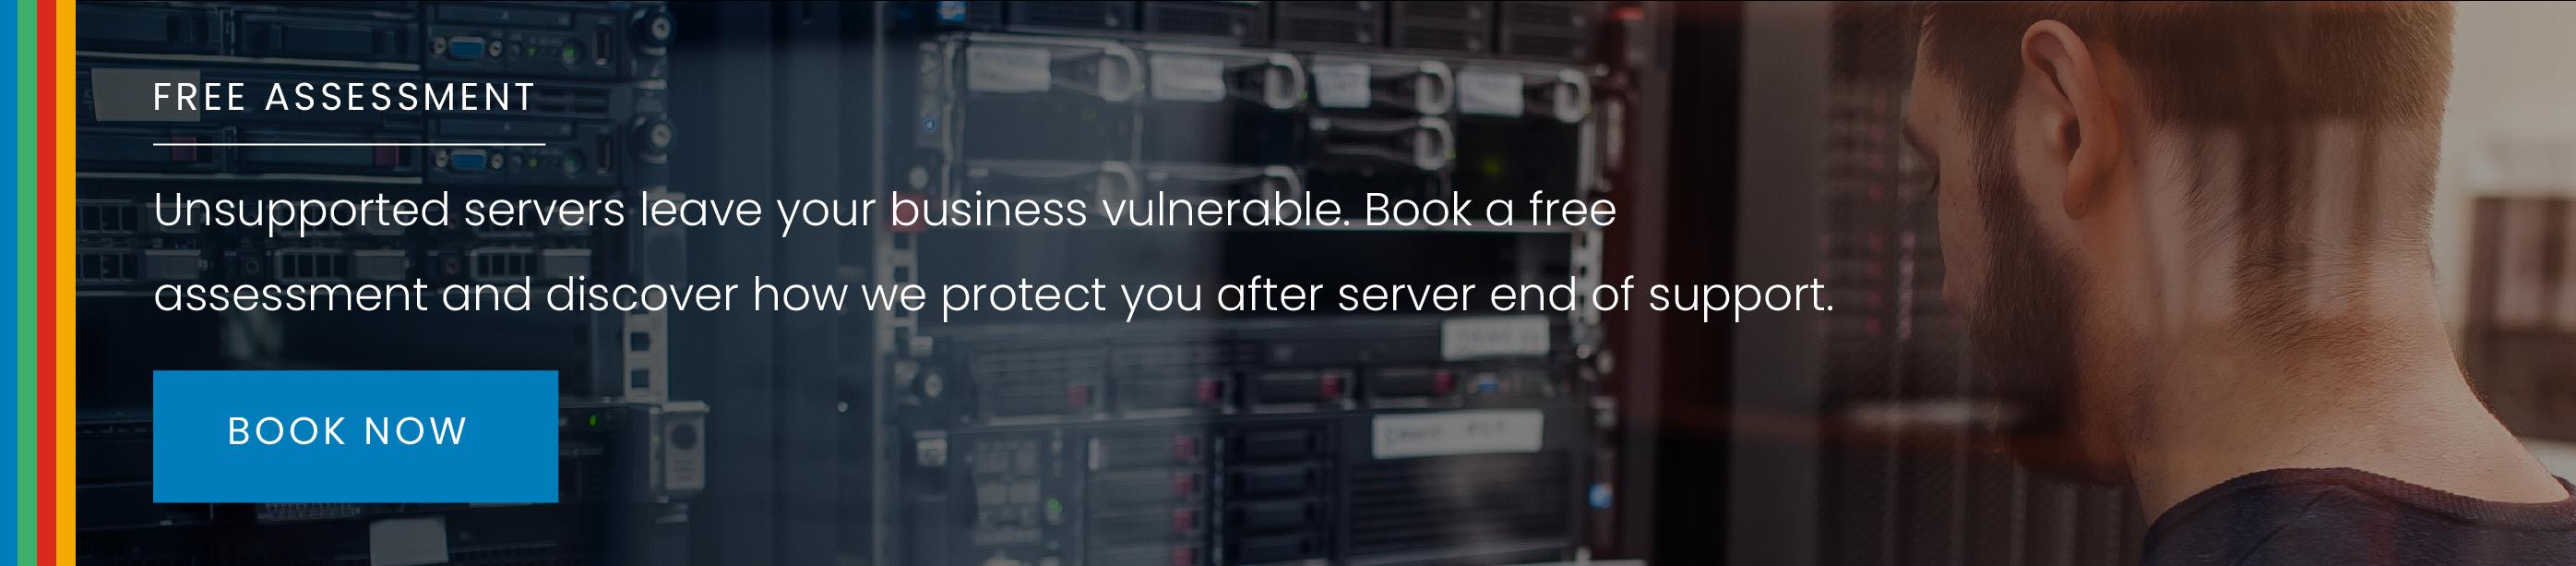 Windows Server image